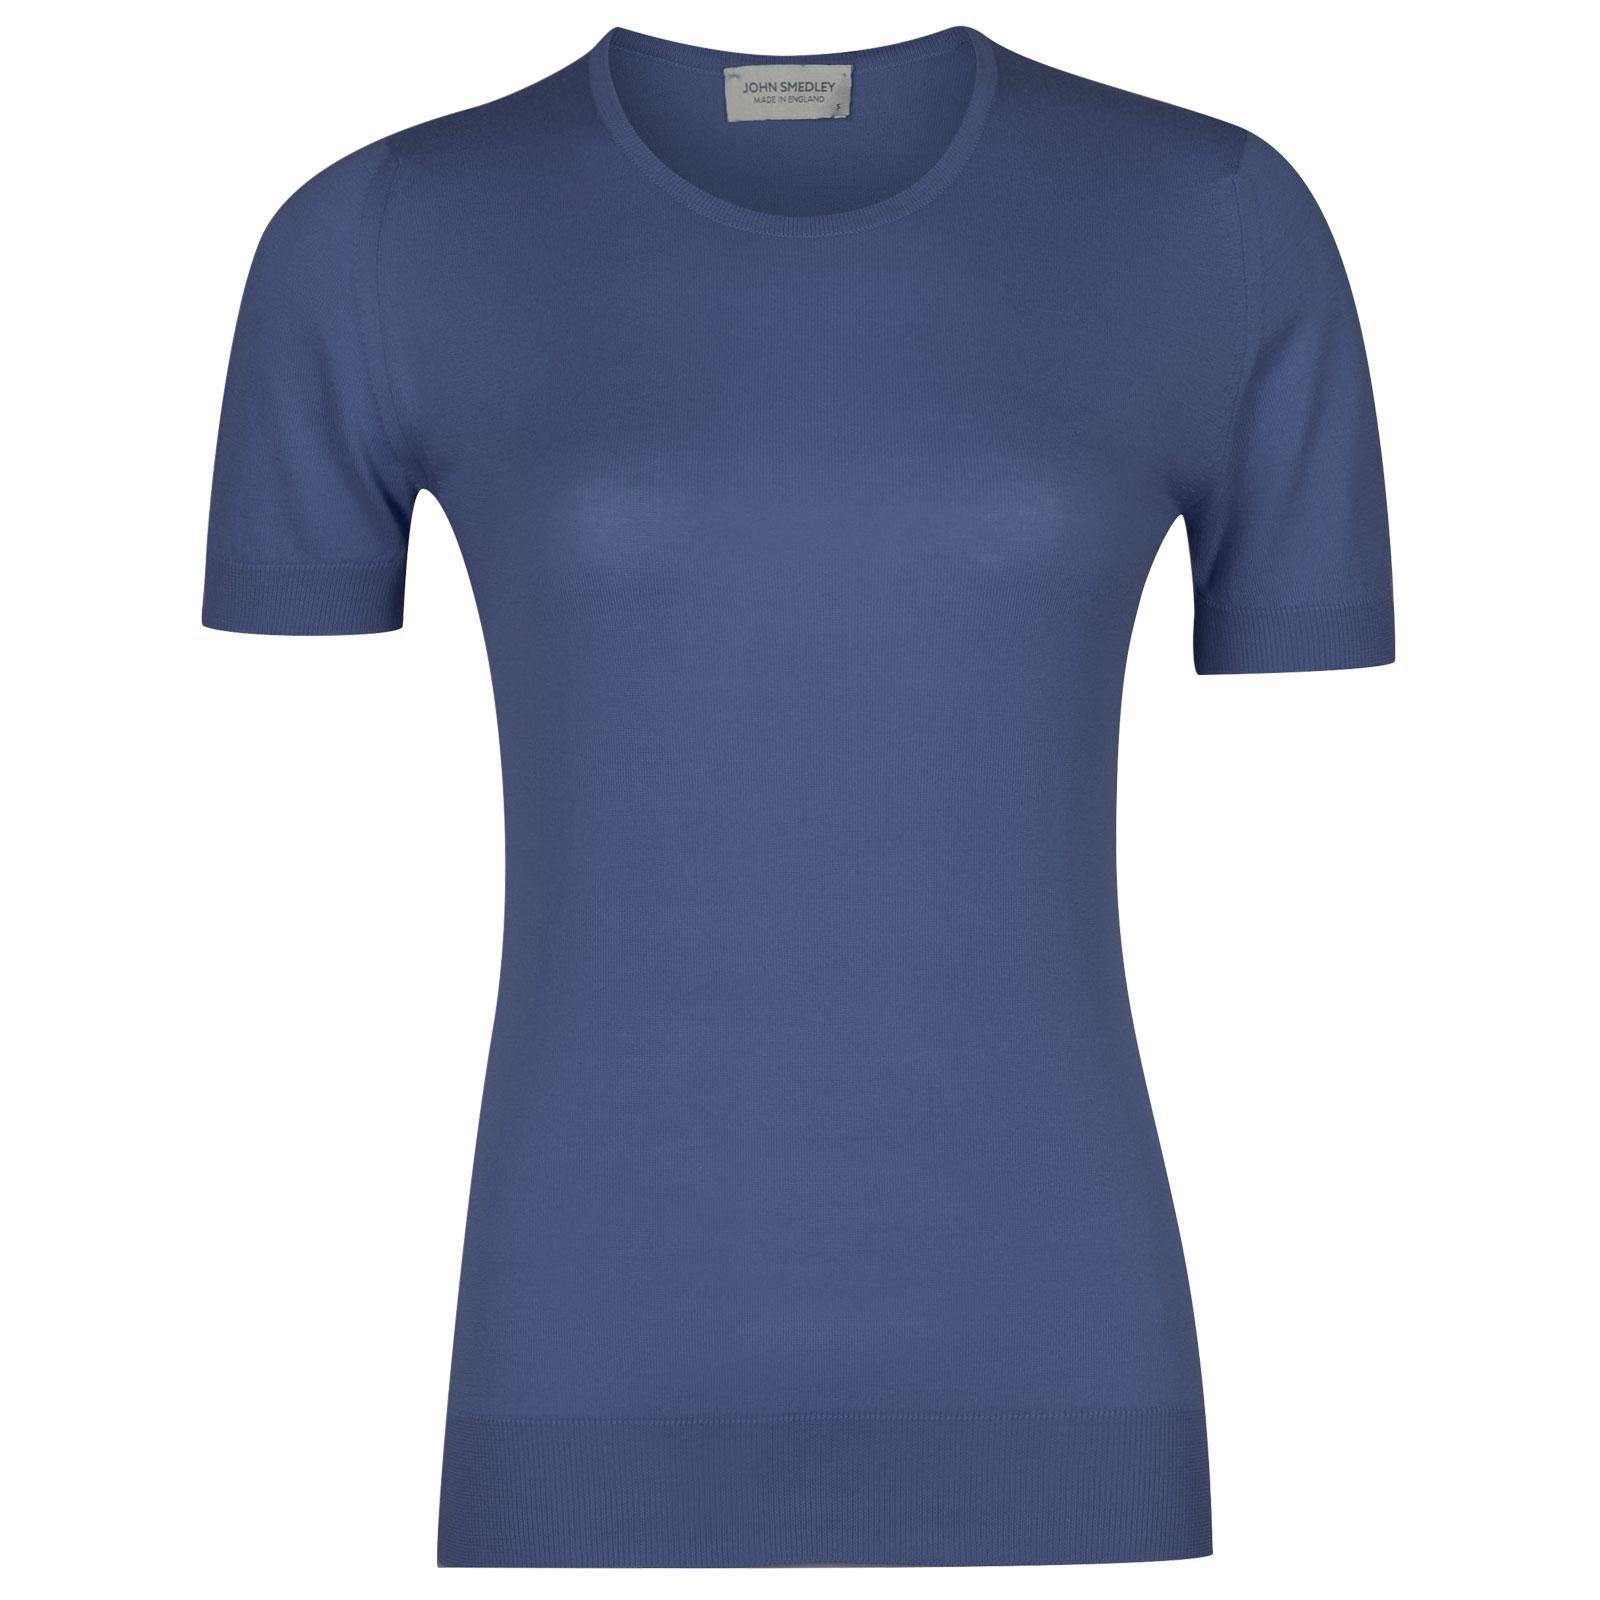 John Smedley Daniella in Blue Iris Sweater-XLG